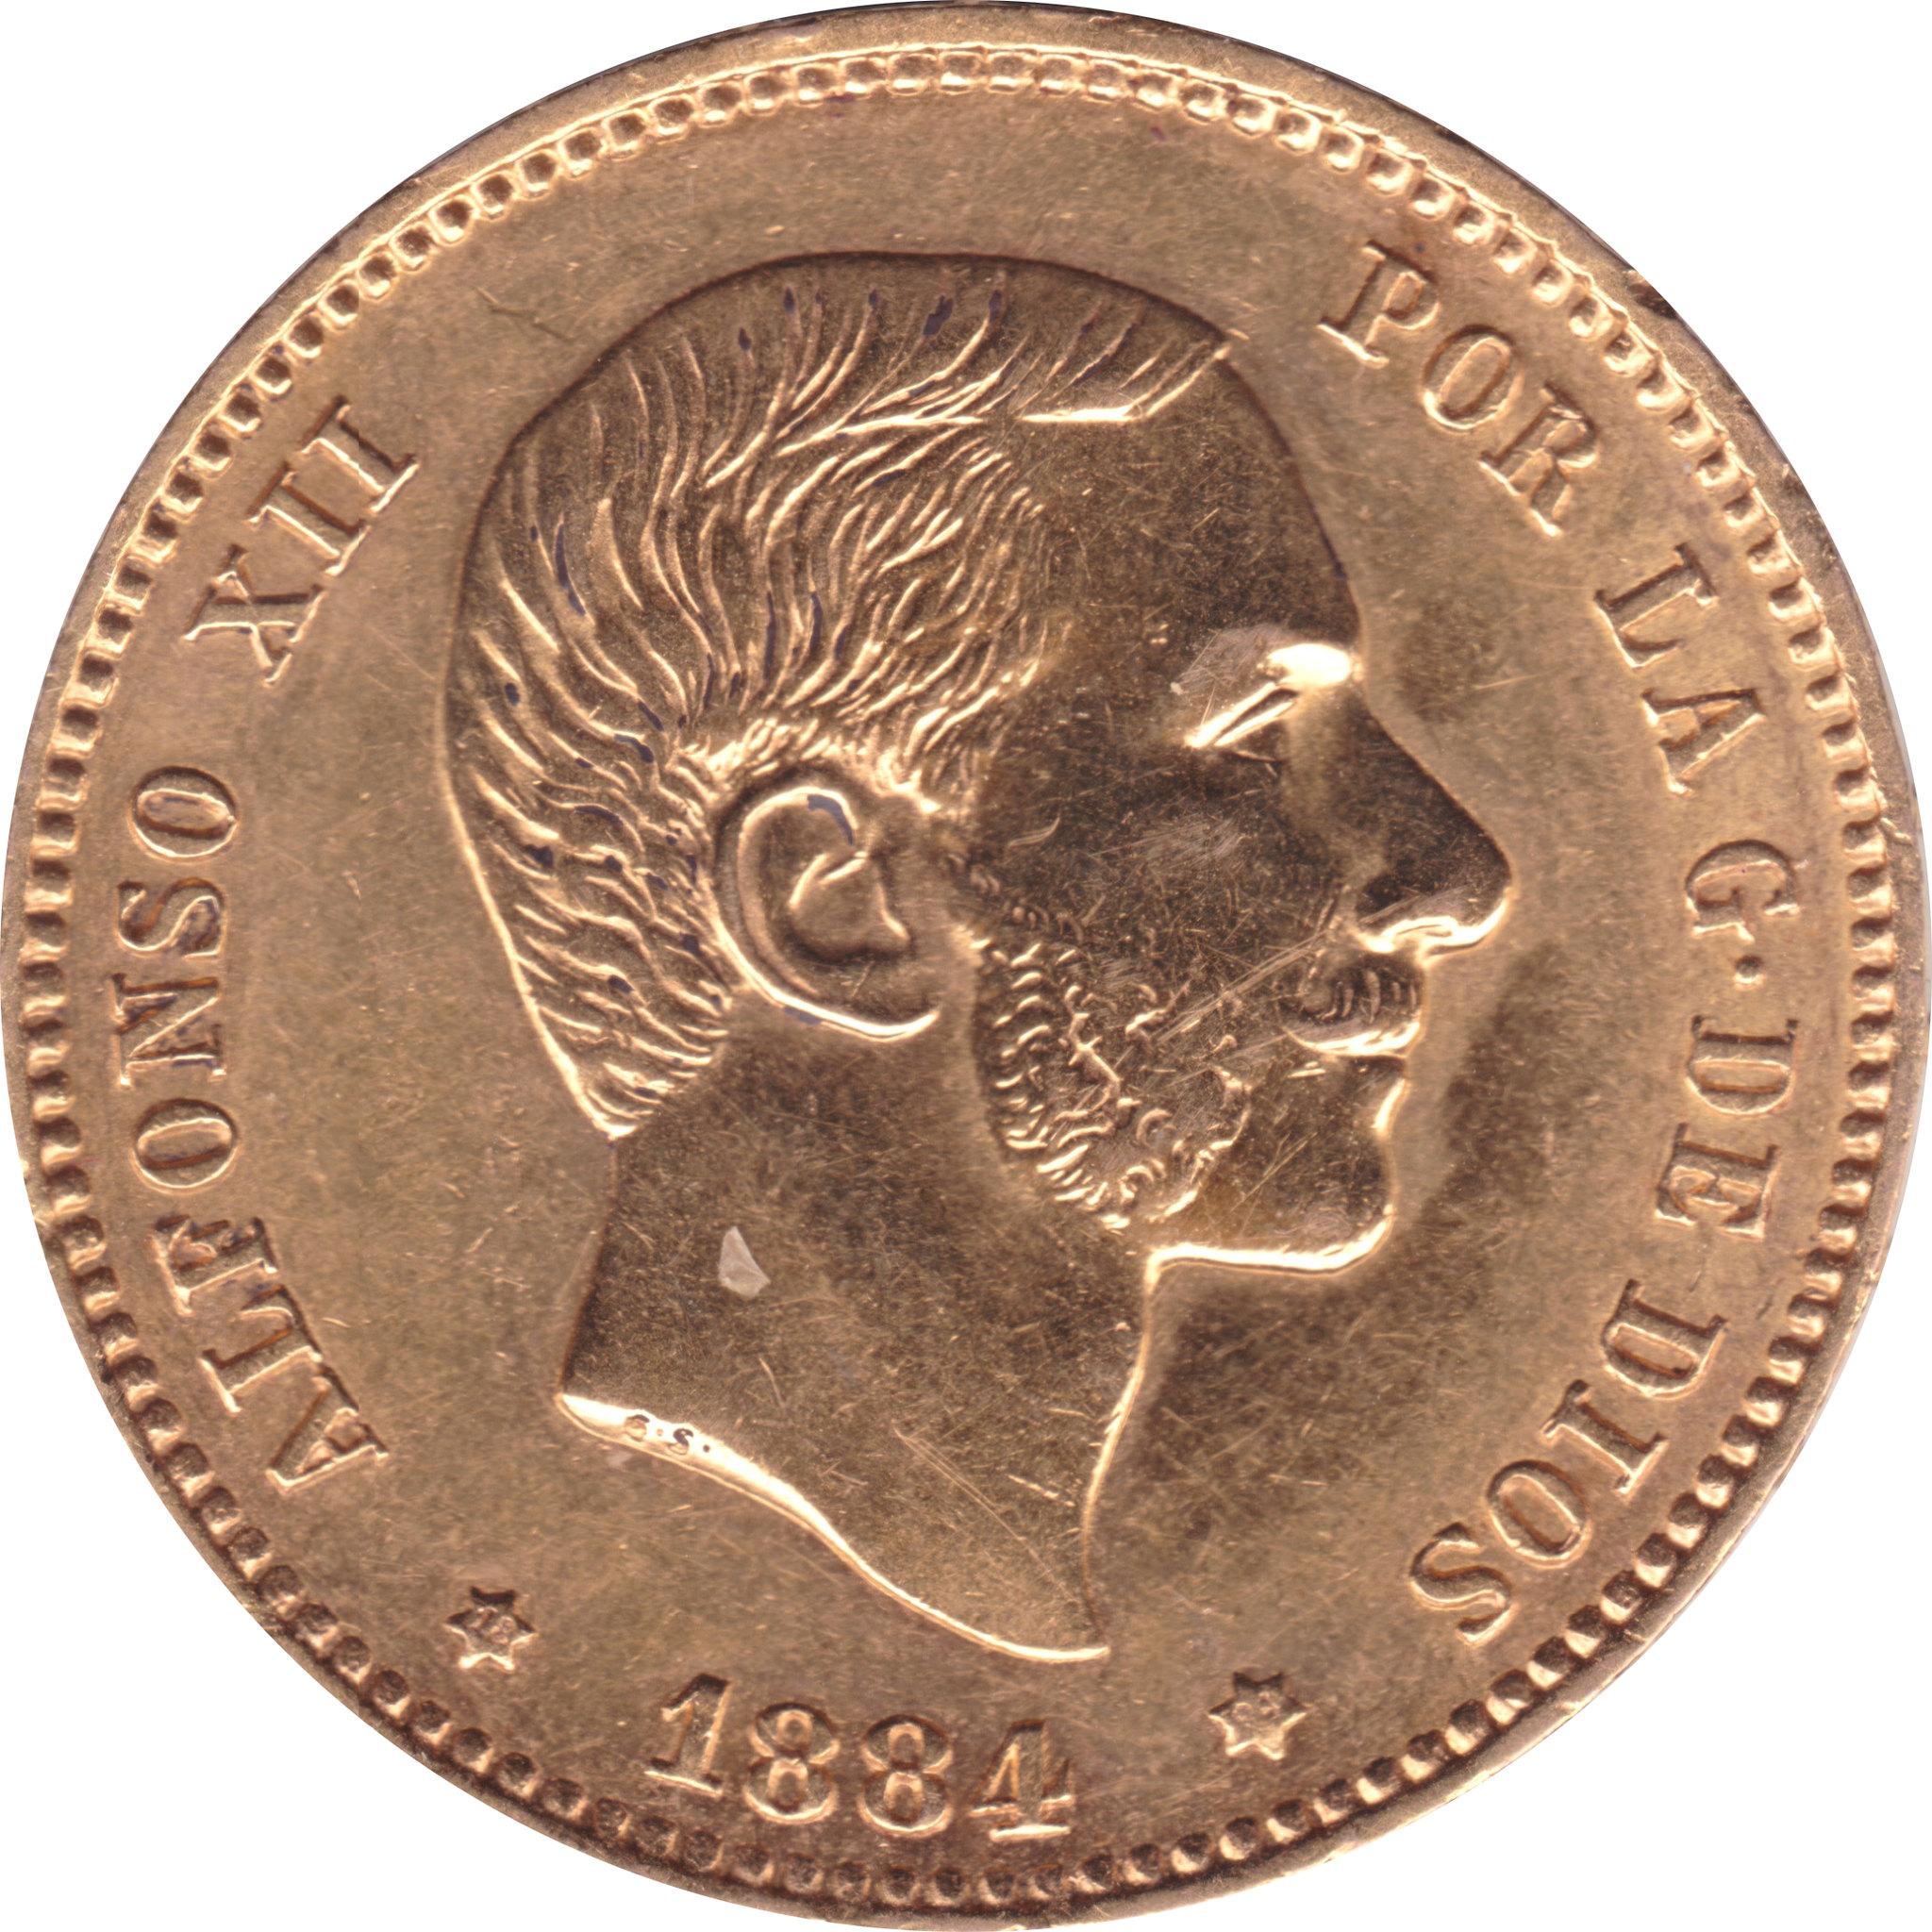 25 Pesetas Alfonso XII 1884 (subasta Soler 7 de mayo) 8744479666_037f459aa8_k